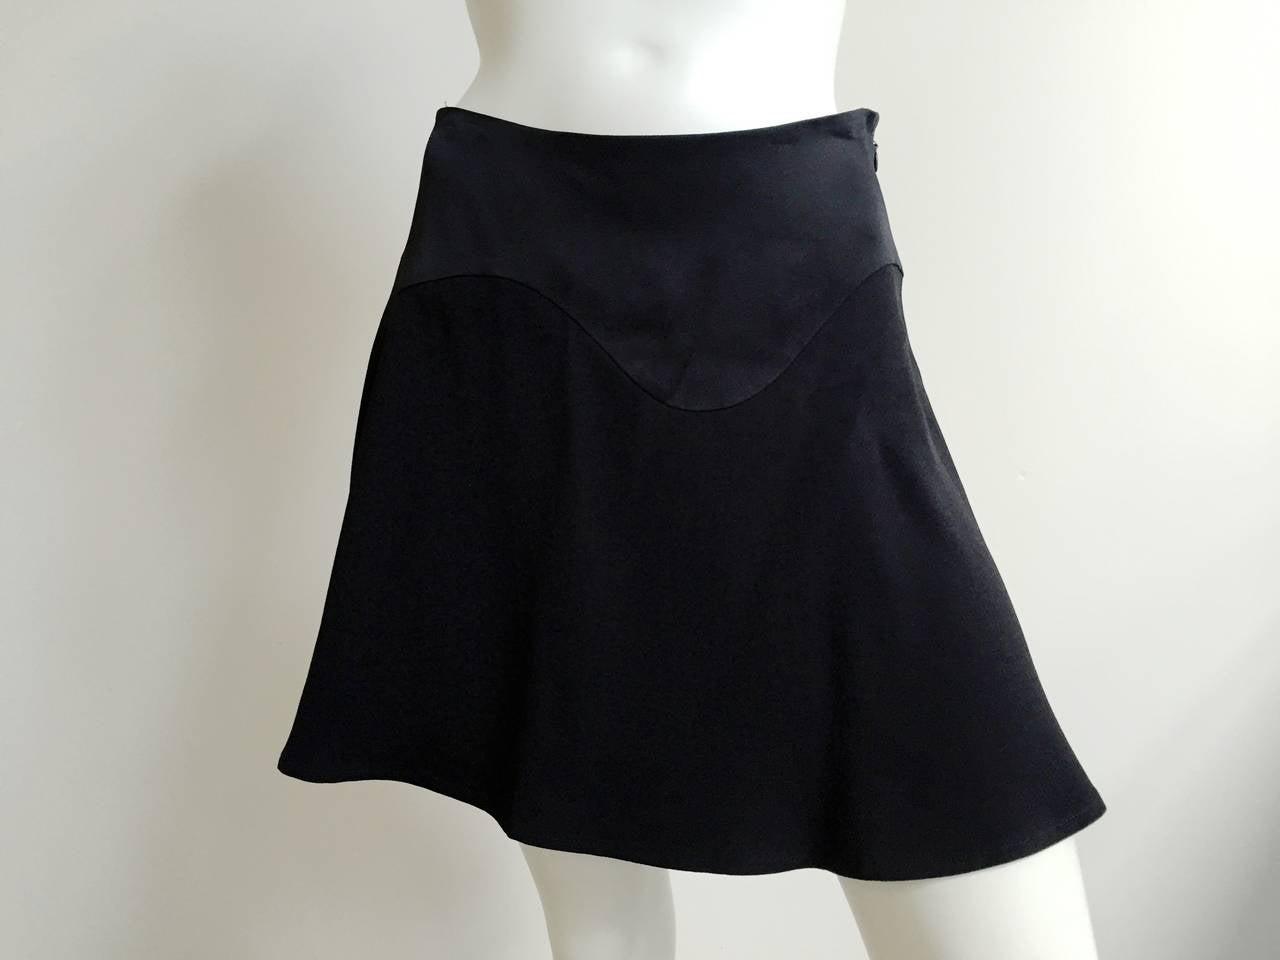 Moschino Black Short Skirt Size 6. 2